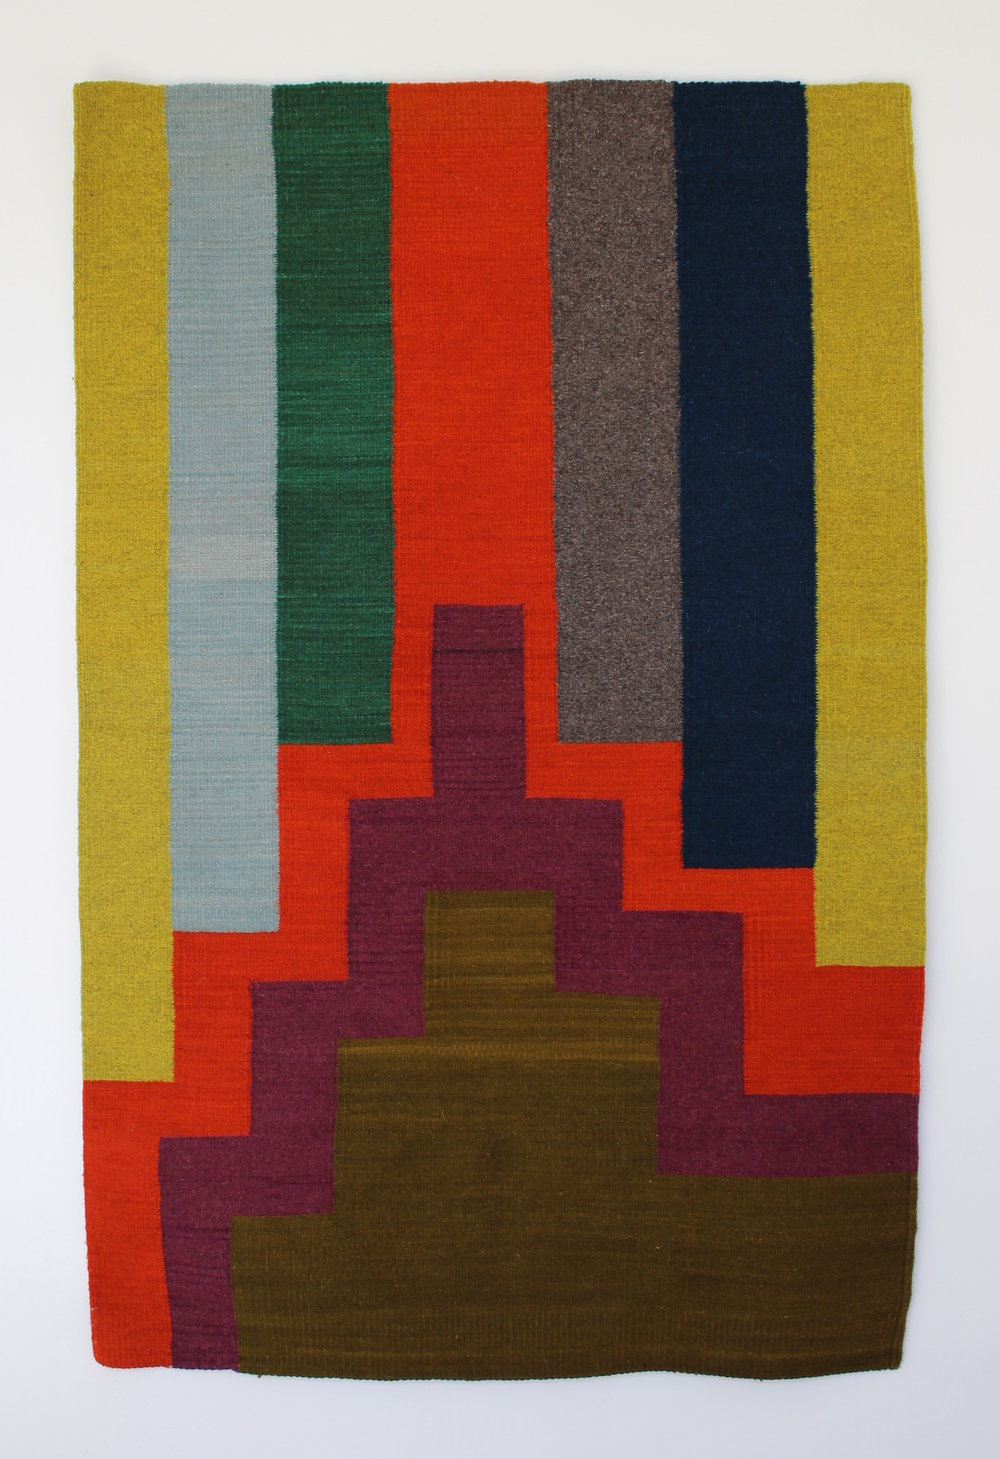 "untitled , 2016, hand-dyed woven wool, 58"" x 37 1/2"", woven by Licha Gonzalez Ruiz"